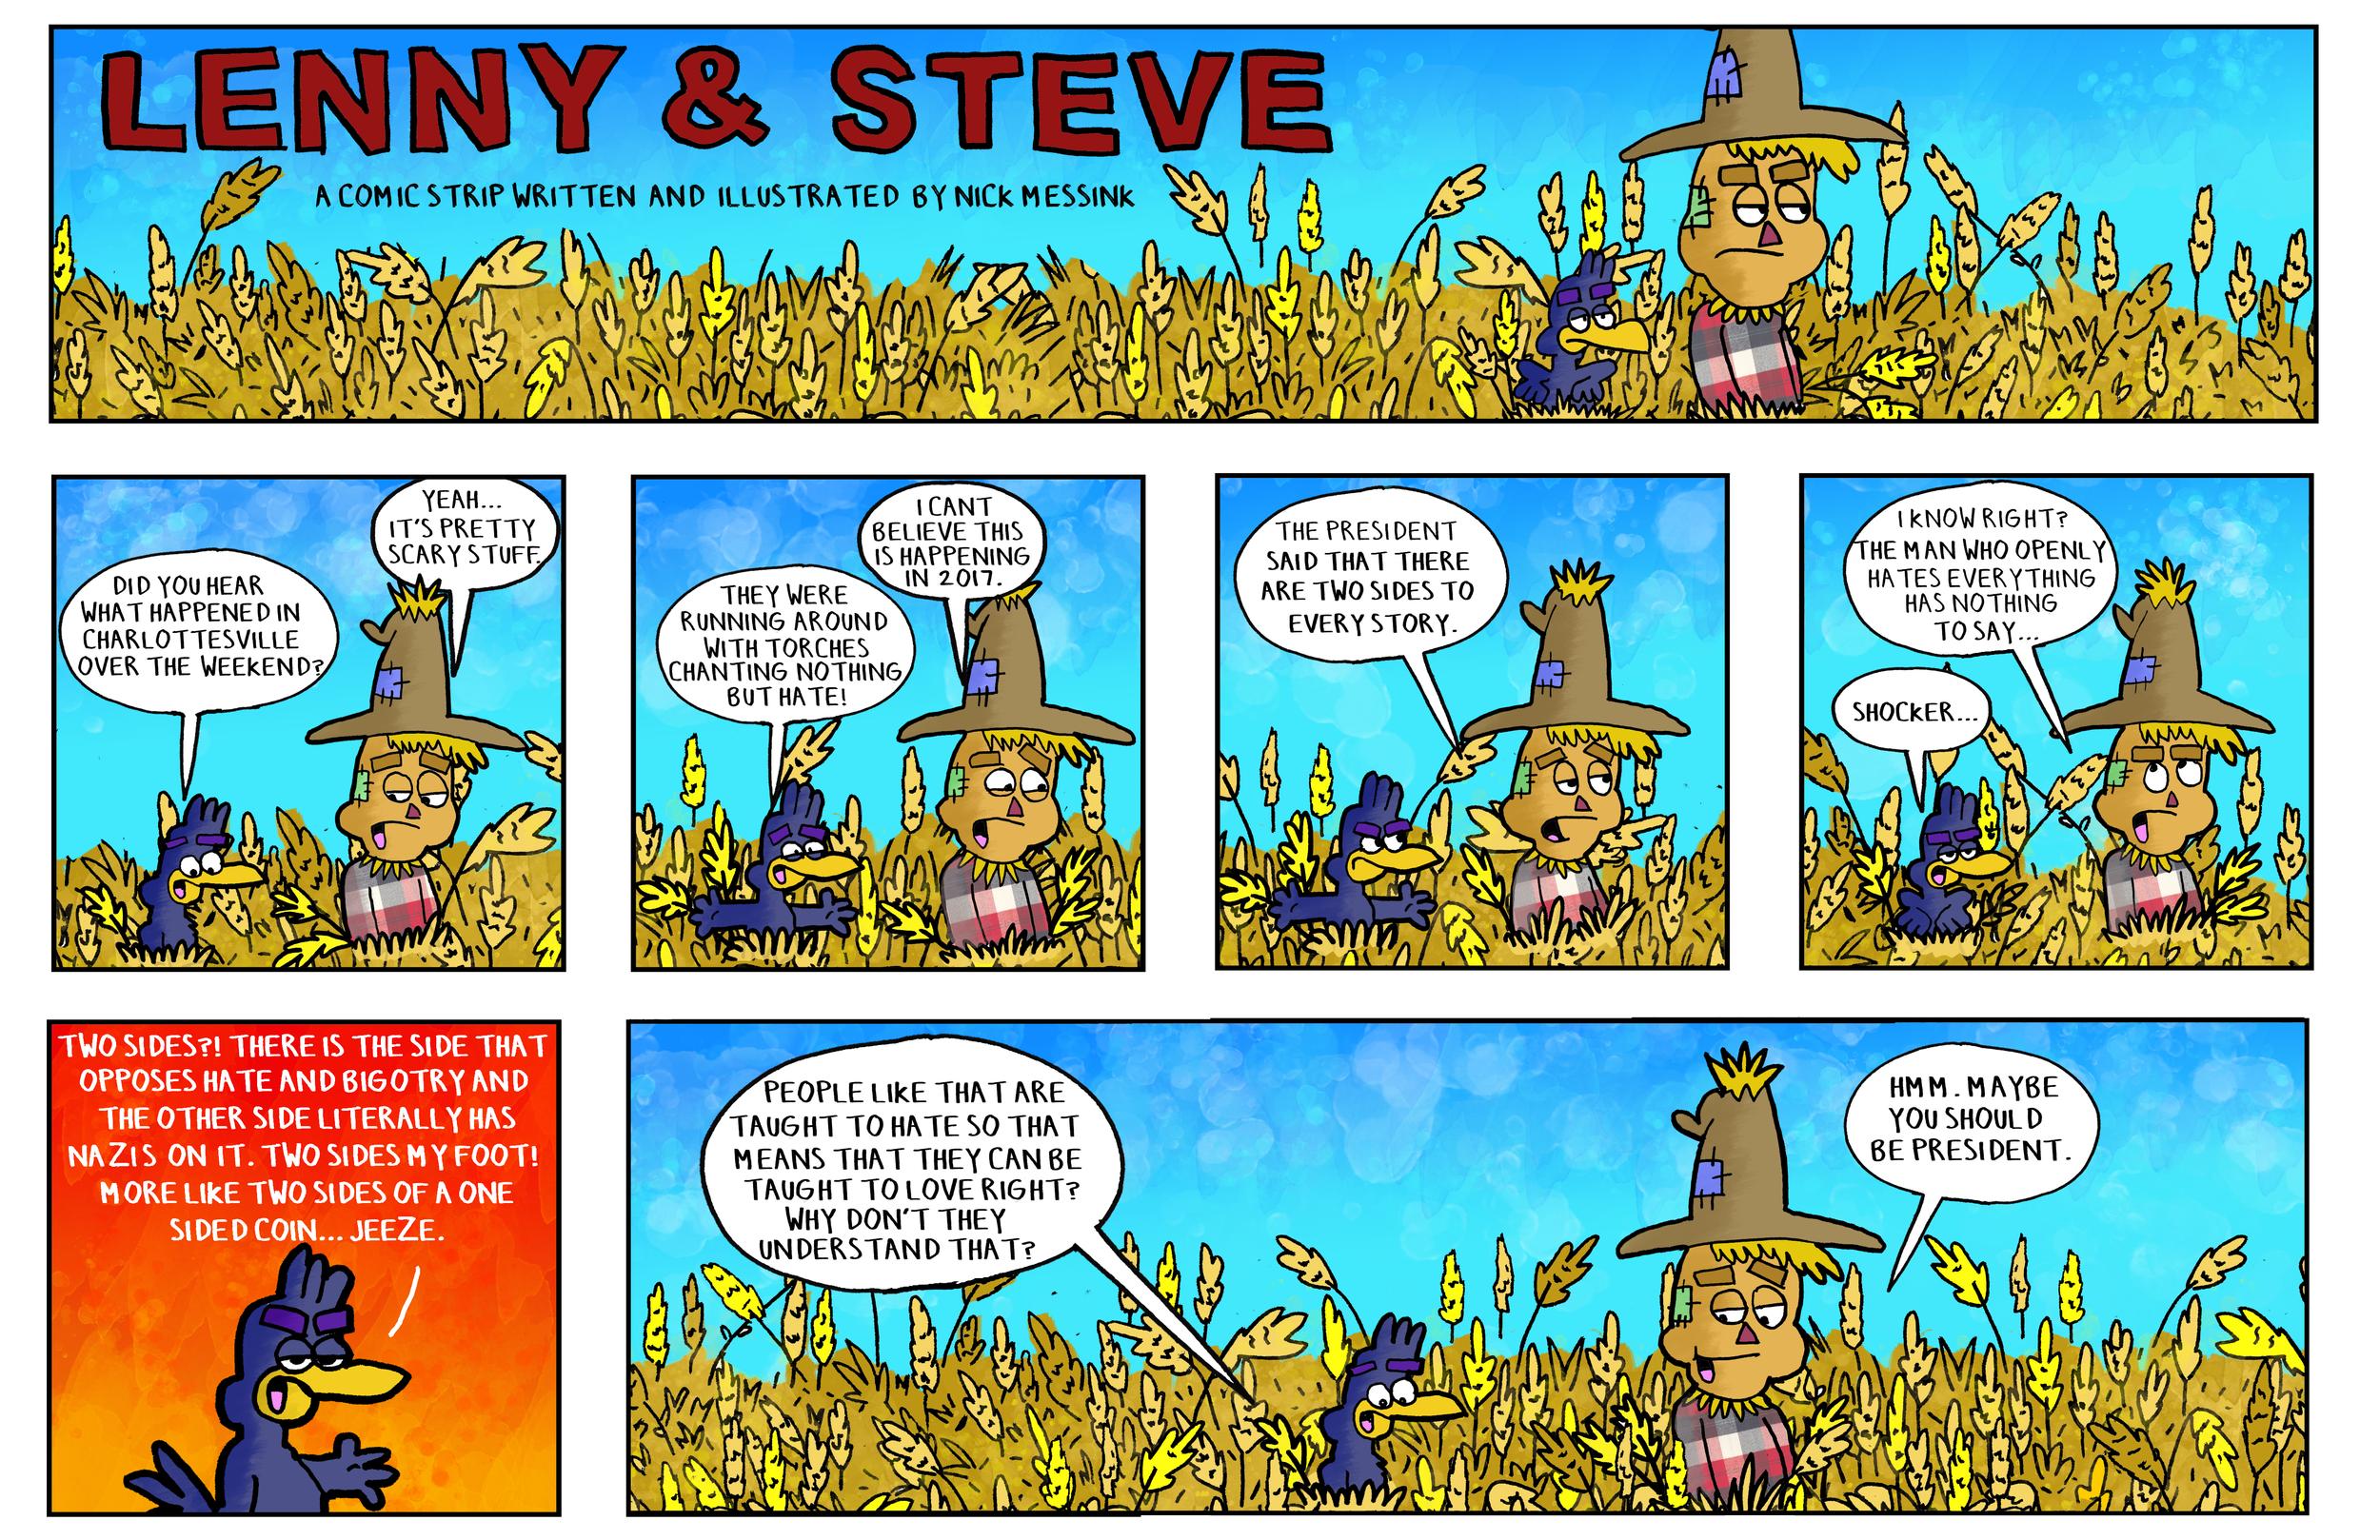 Lenny&SteveLayout.png